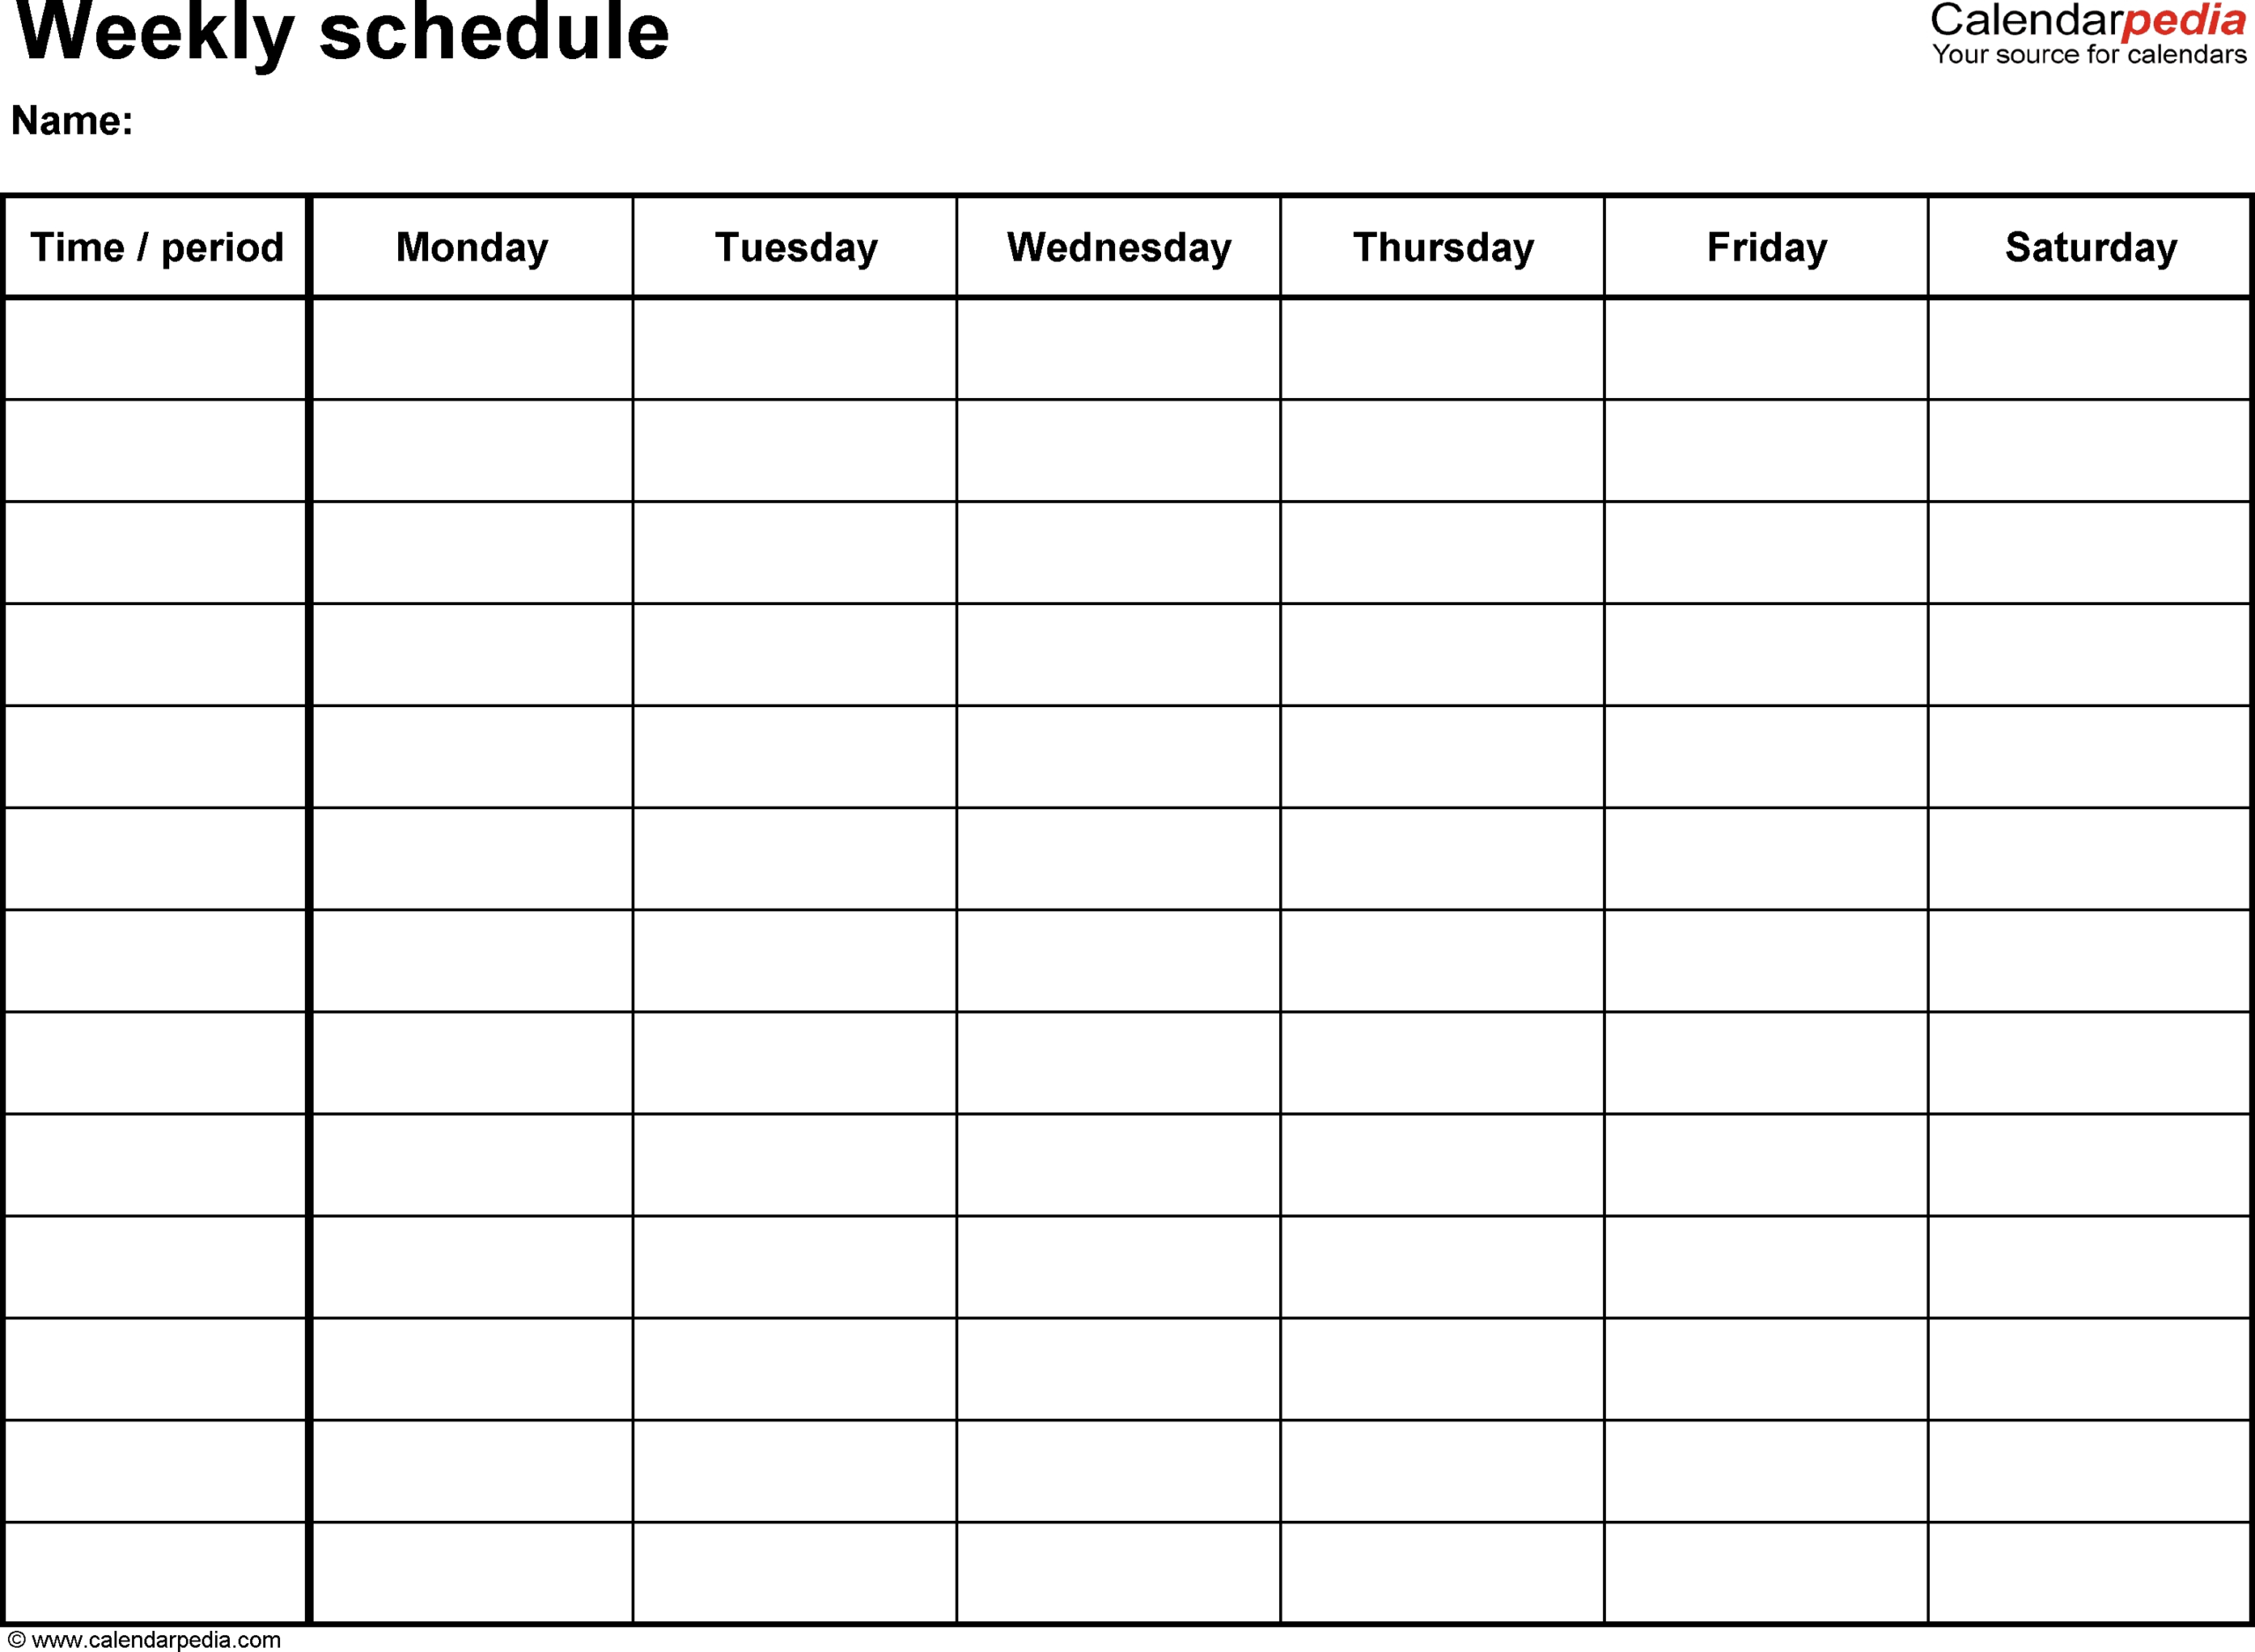 Free Fill In Calendar Templates Month - Calendar within Free Fill In Calendar Template